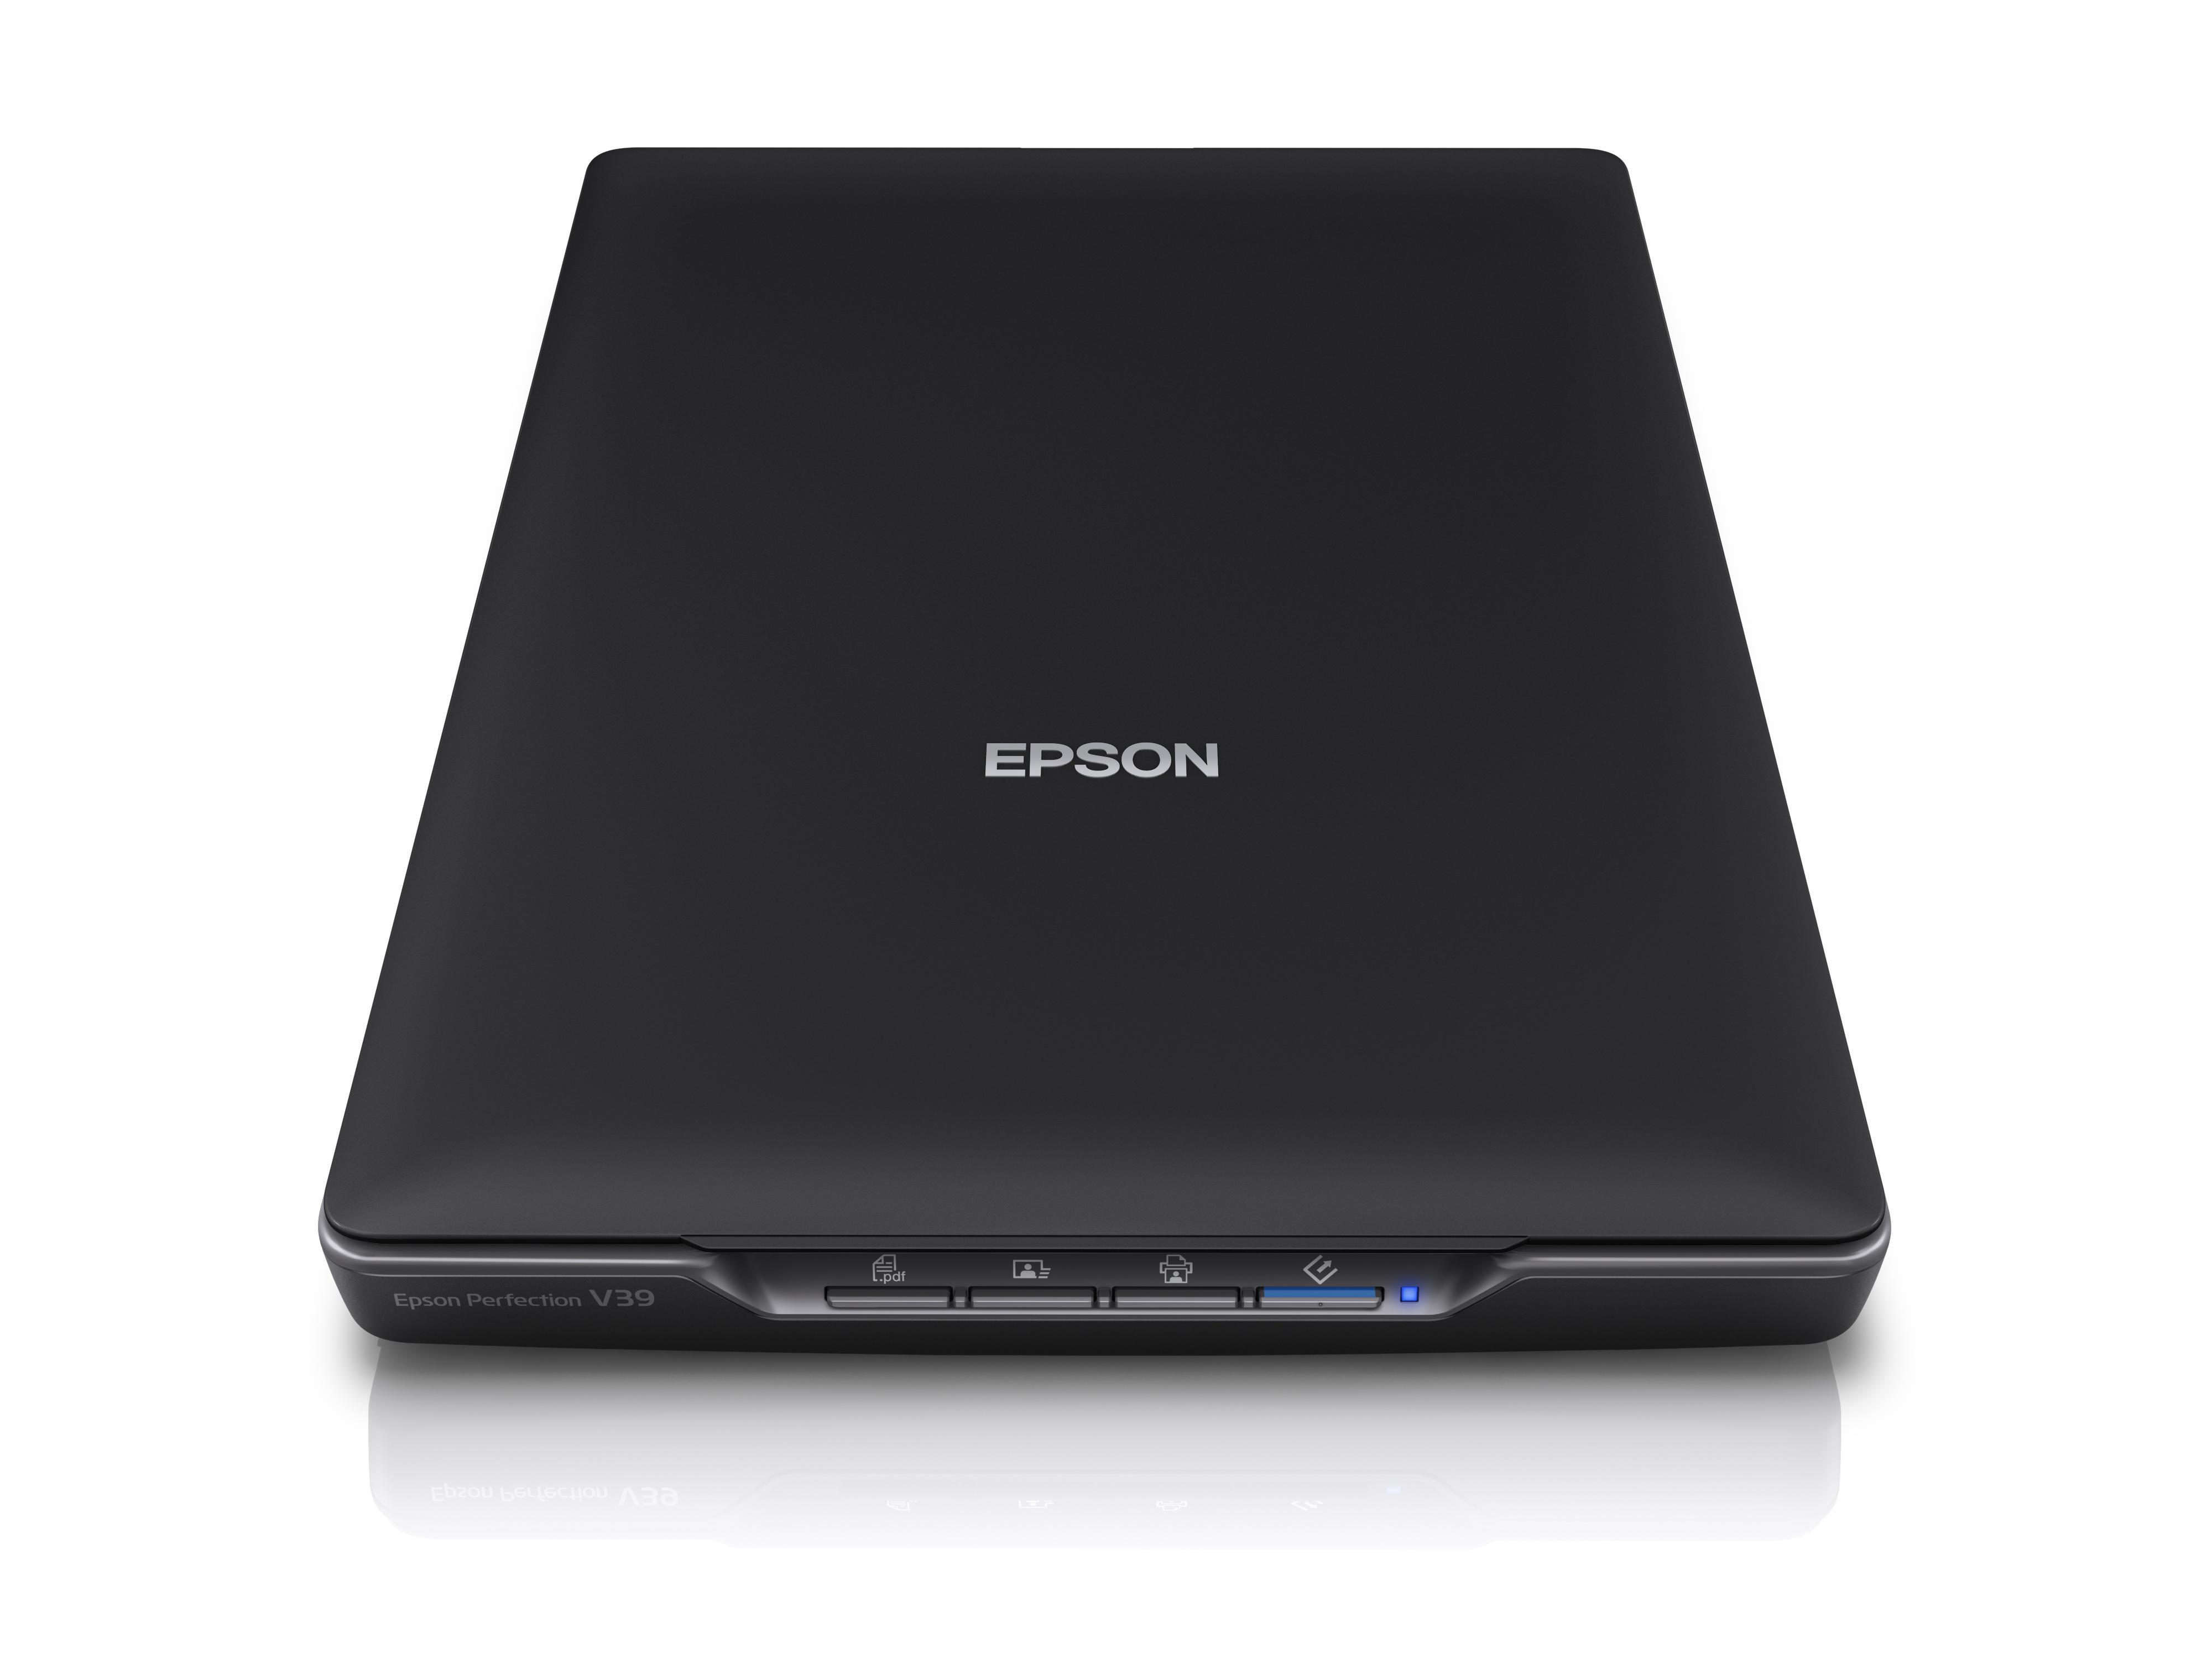 EPSON Perfection V39 輕薄照片/書本掃描器